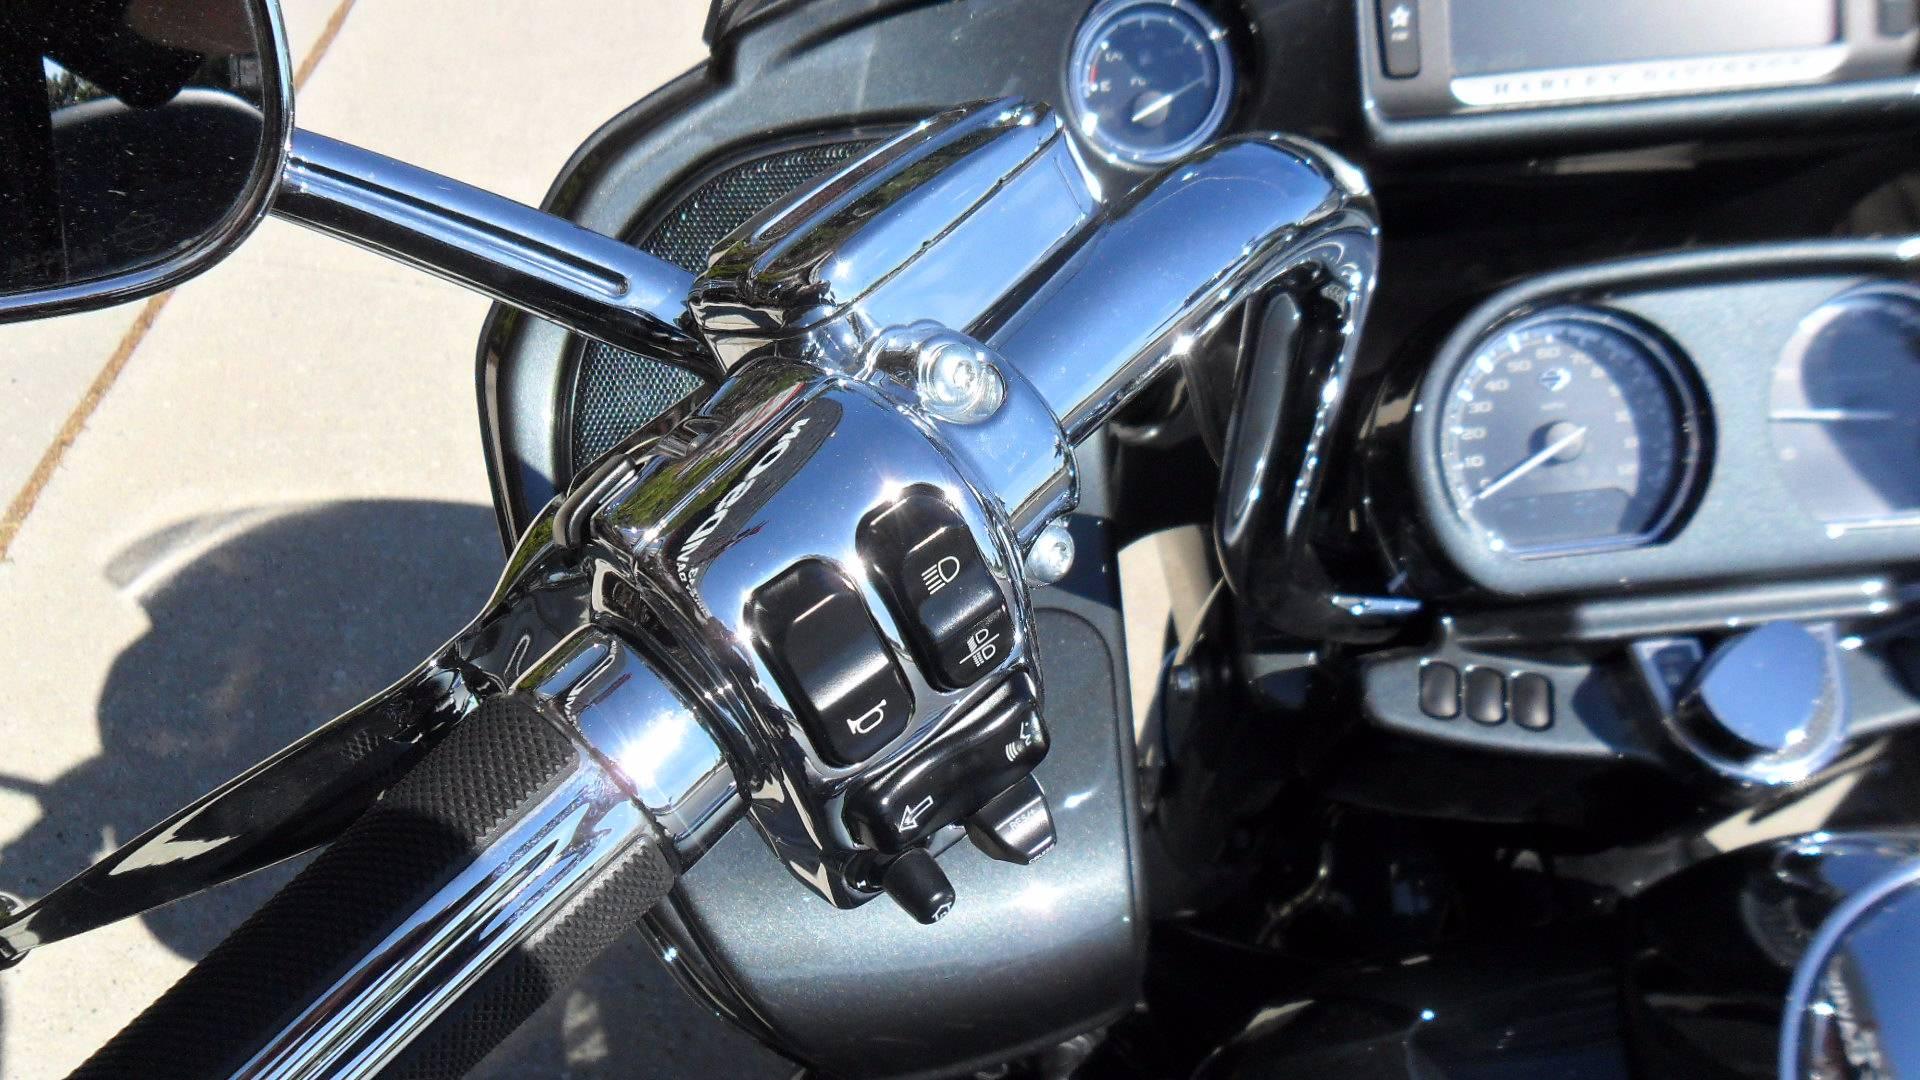 2016 Harley Davidson Cvo Road Glide Ultra In Sheboygan Wisconsin